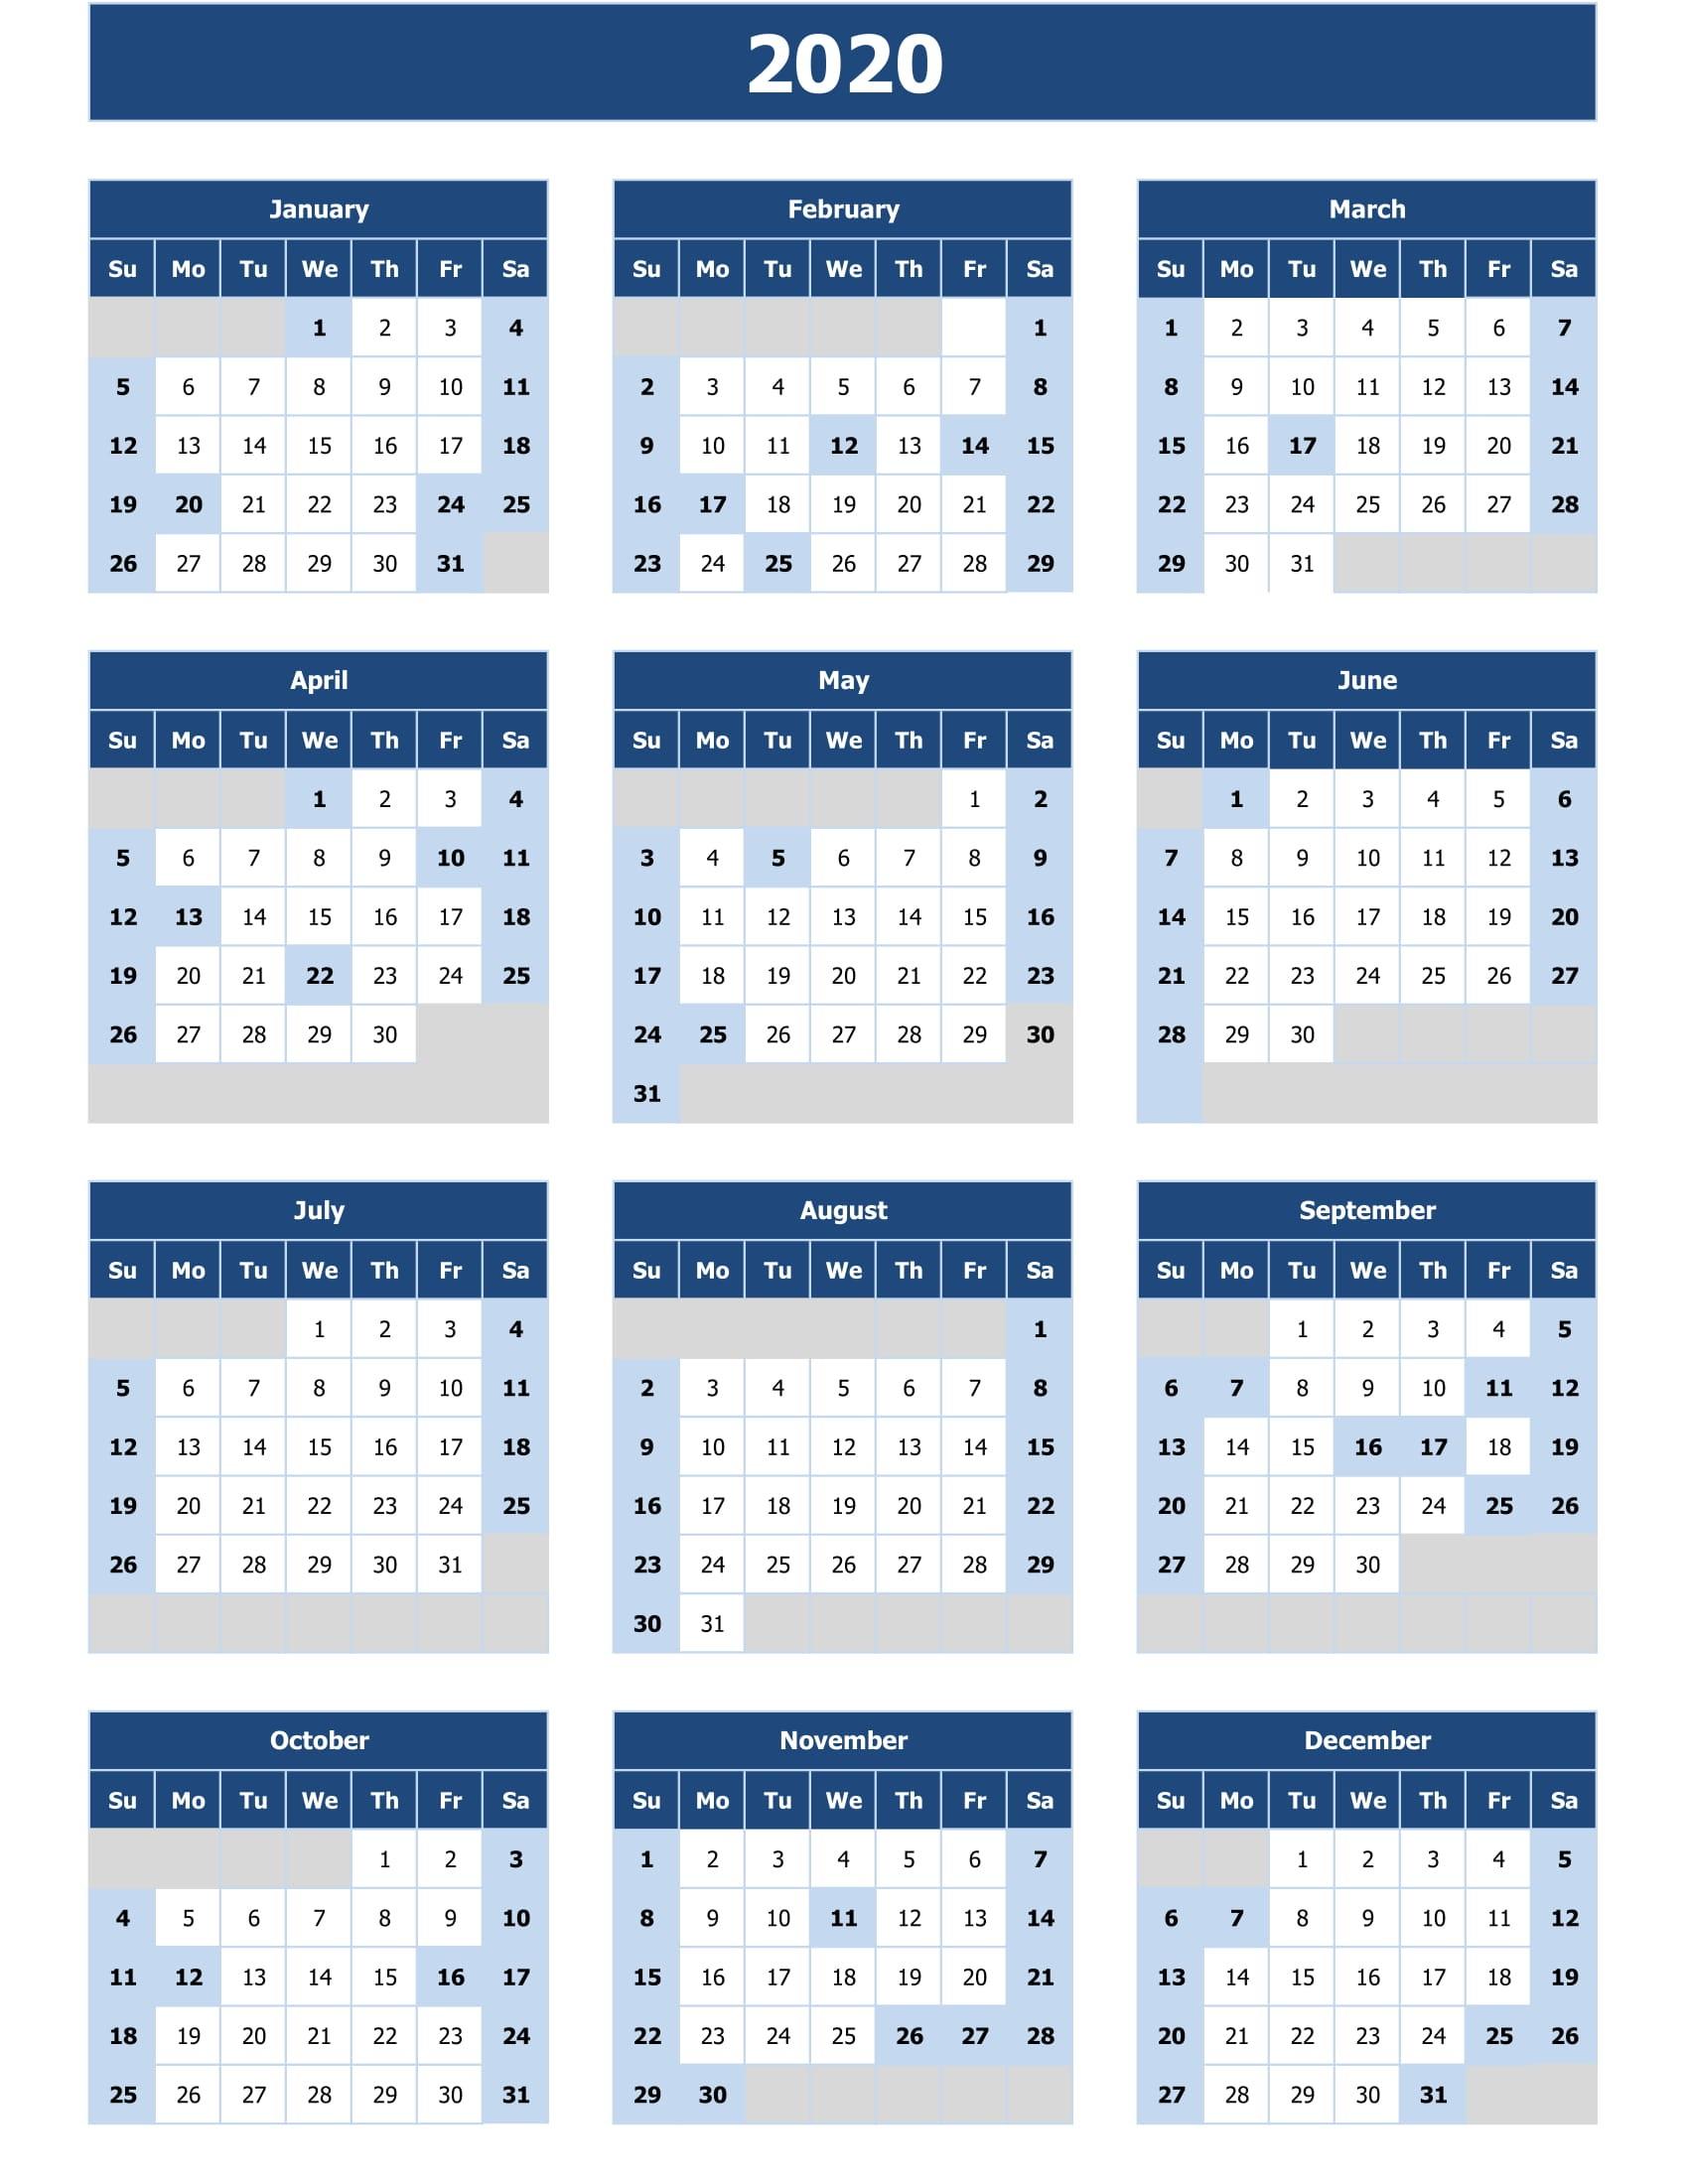 2020 Calendar Excel For Your Good Day For Desk | Calendar with regard to 2020 Excel Calendar